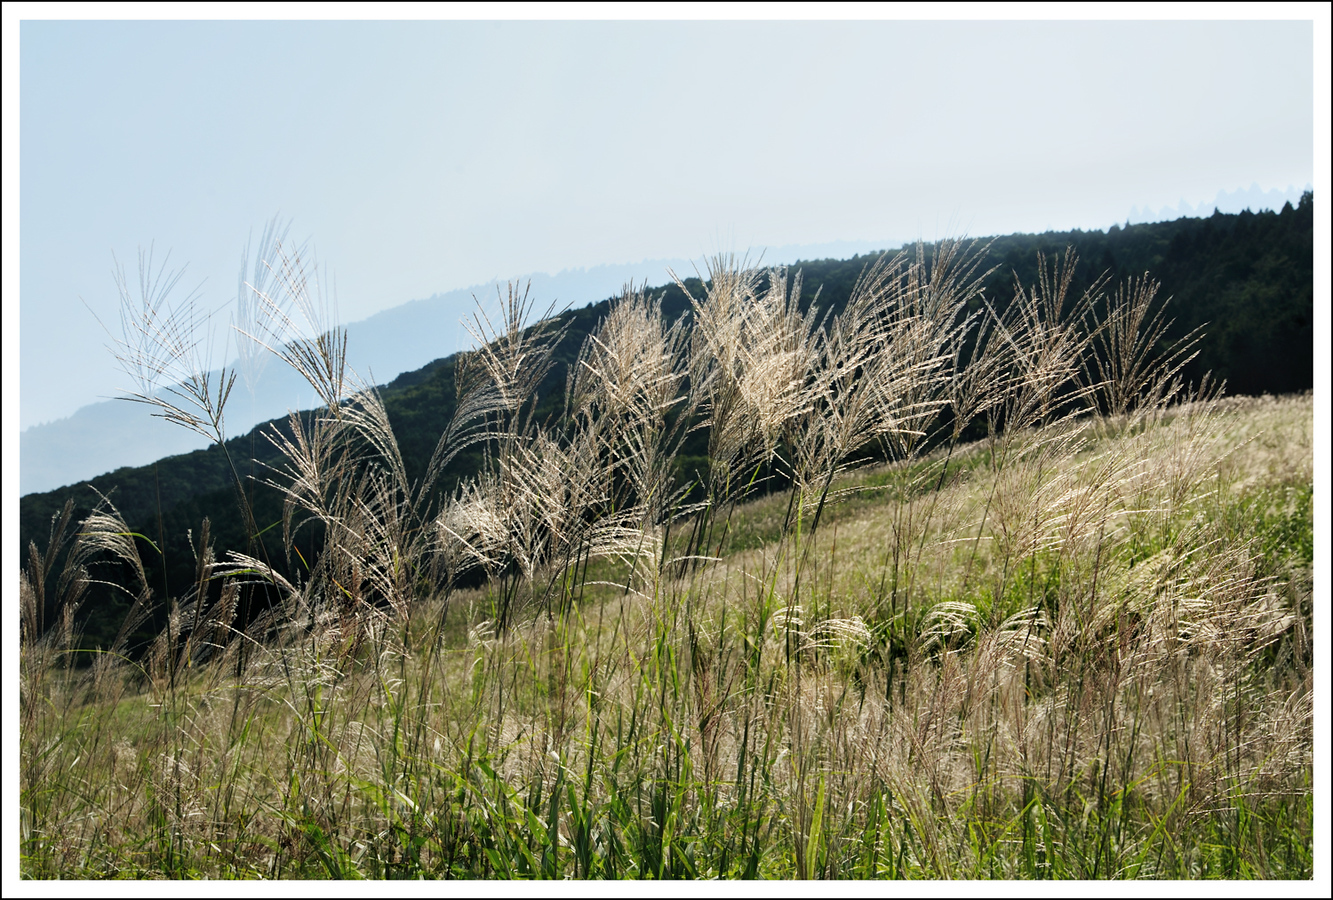 Double exposure.  Sengokuhara pampas grass field